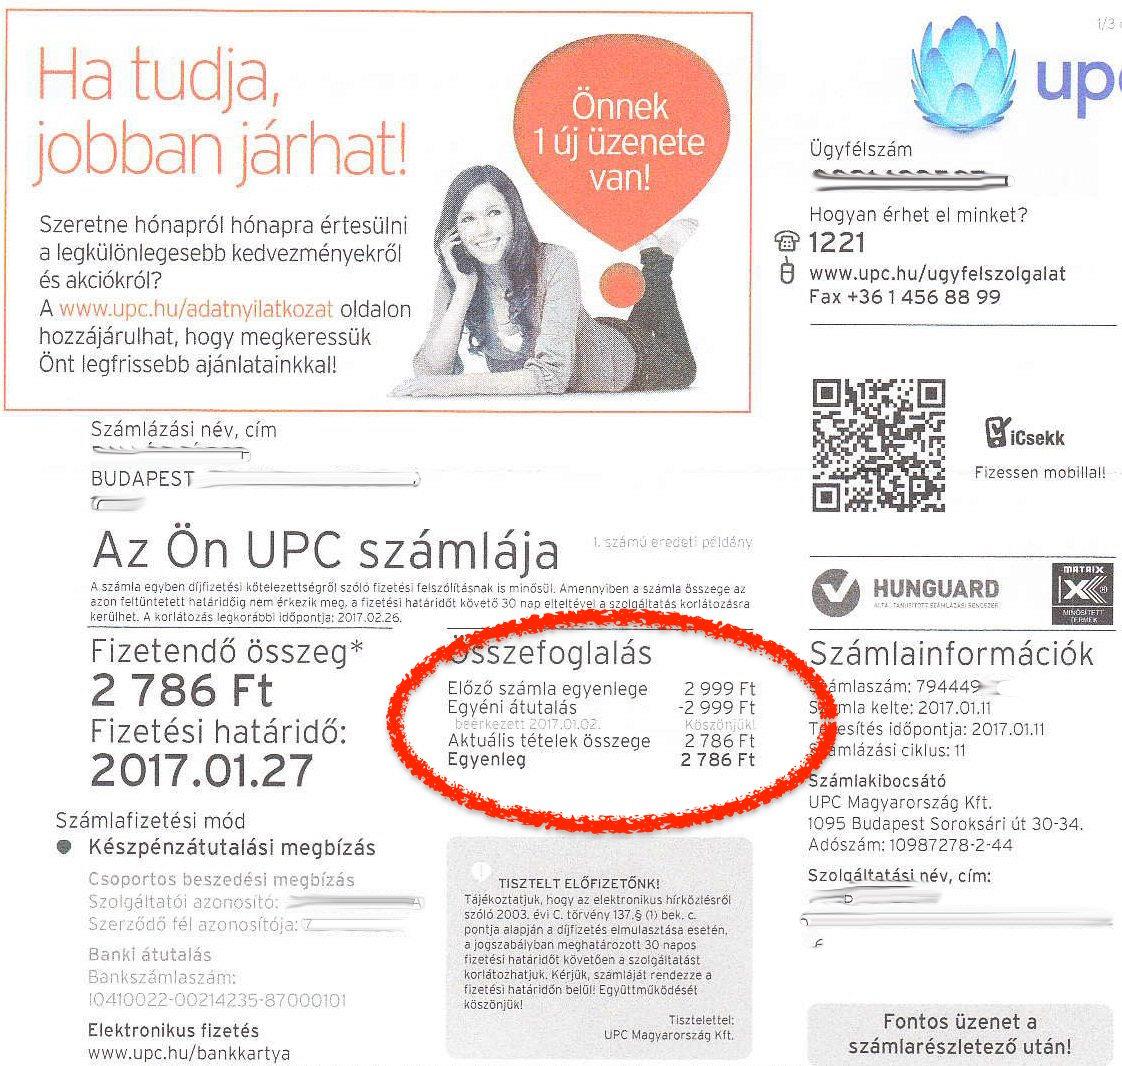 upc-afacsokkentes-01.jpg